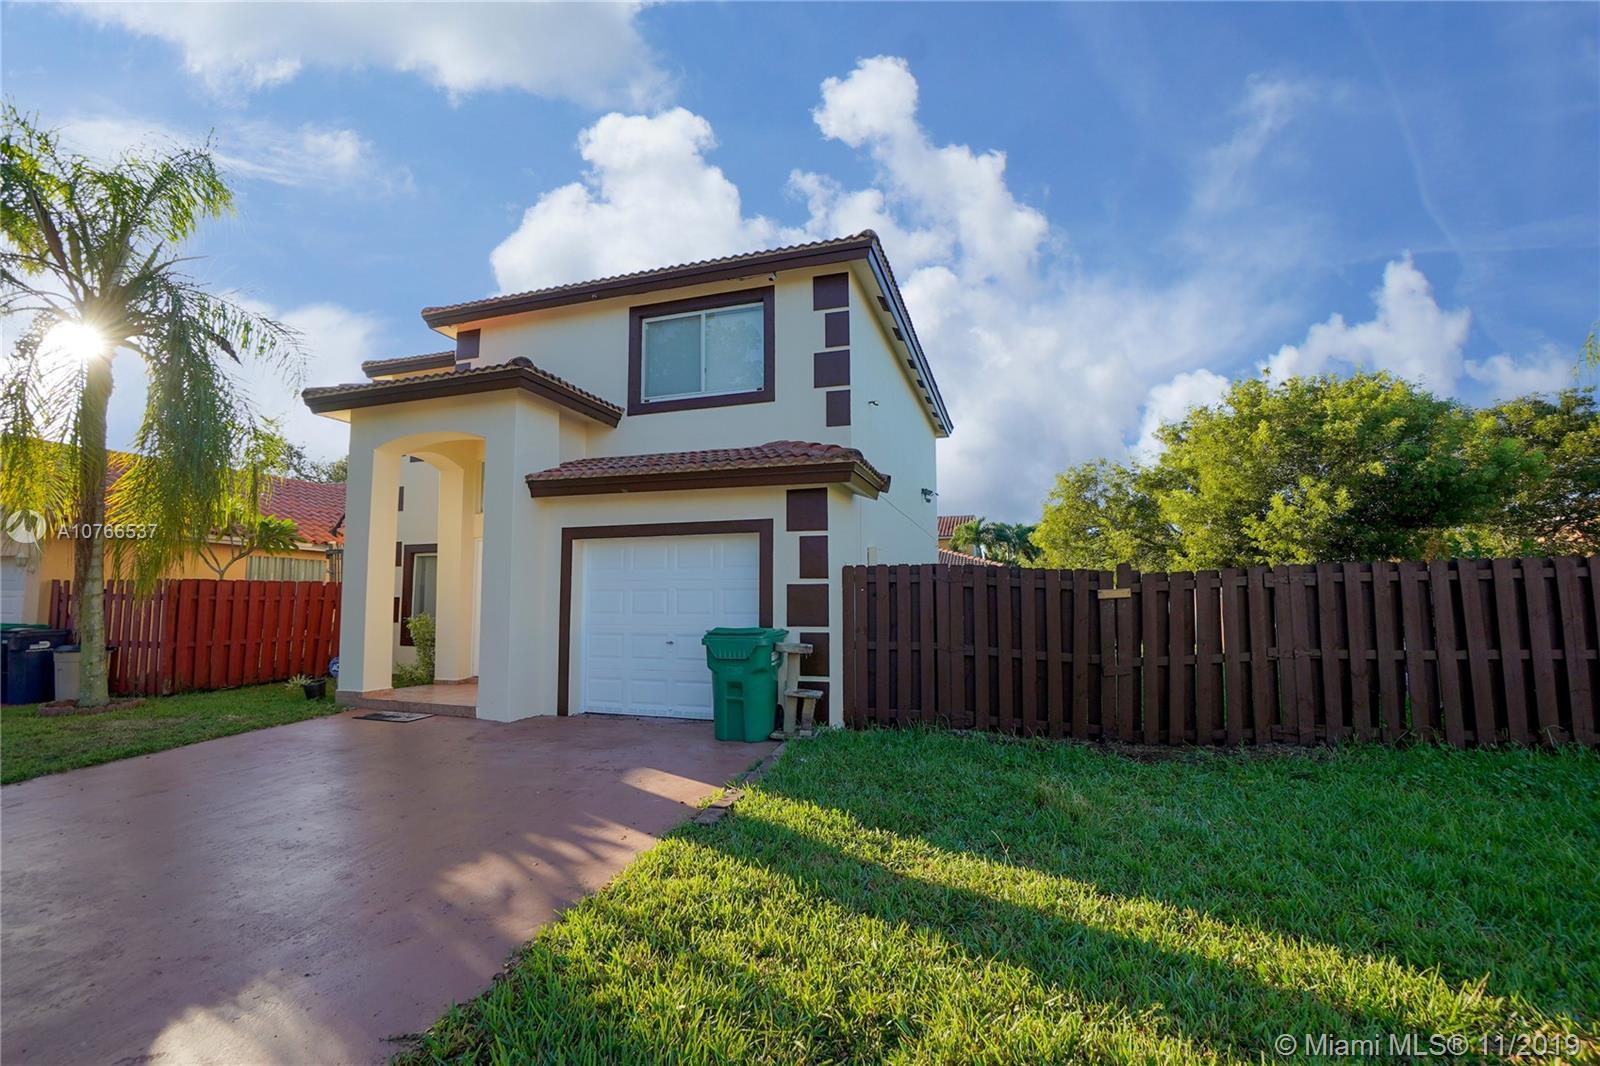 12310 SW 250th Ter, Homestead, FL 33032 - Homestead, FL real estate listing